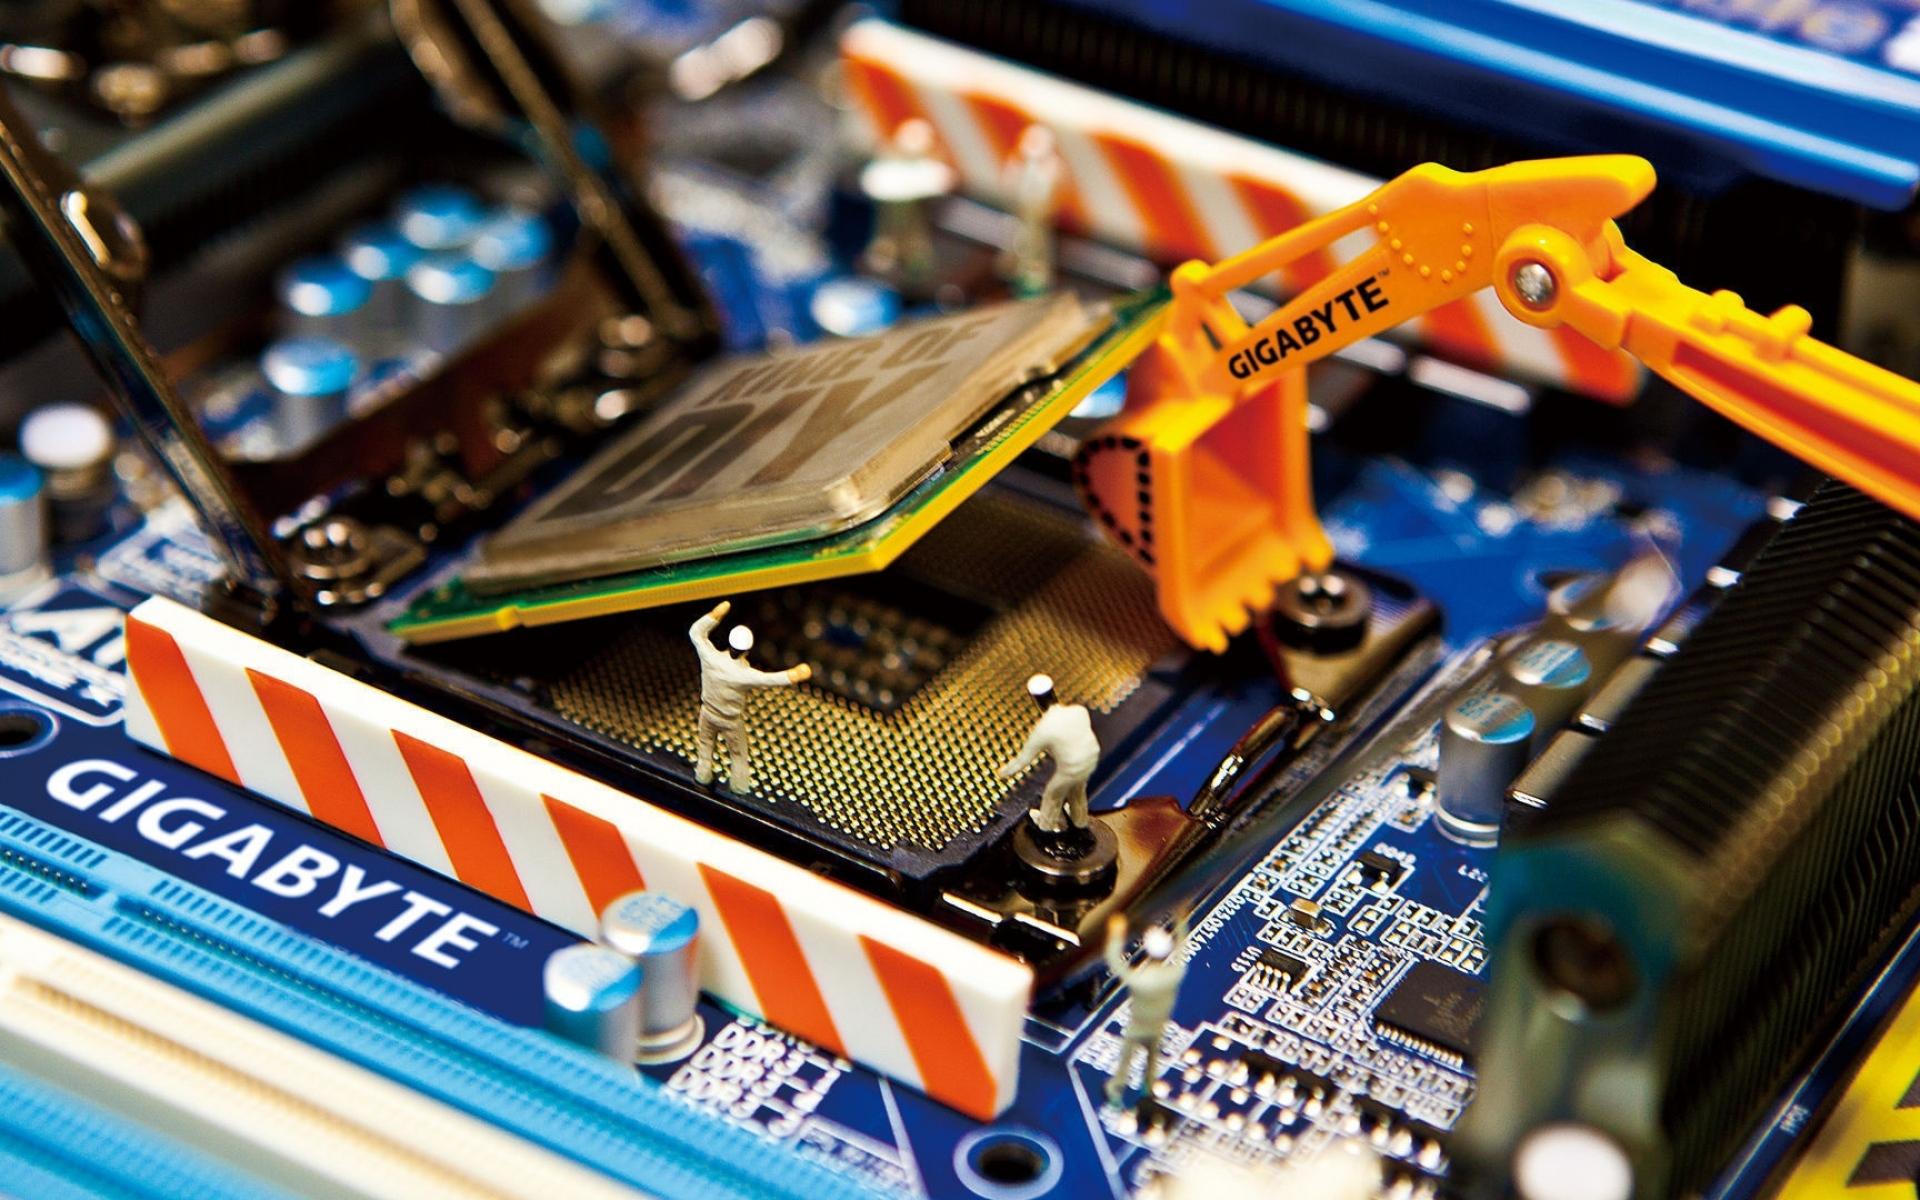 gigabyte_motherboard_installing_dolls_processor_26165_1920x1200